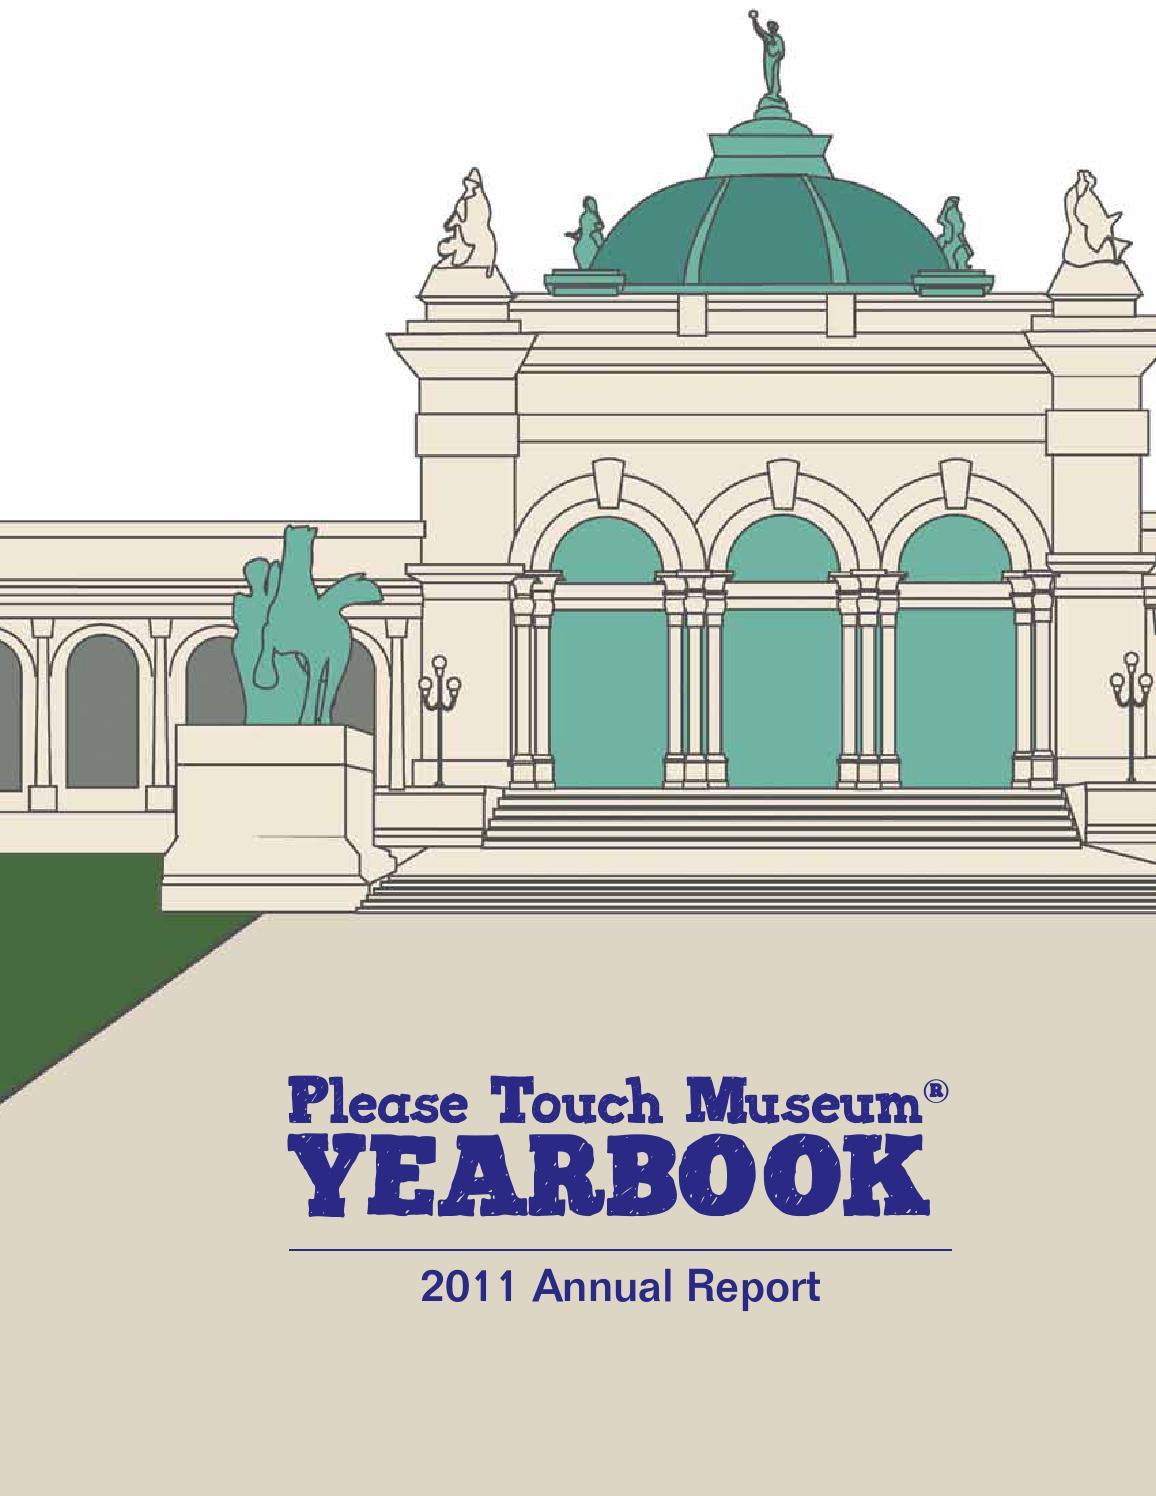 muralarts annual report 2015 by steve weinik issuu ptm 2011 annual report